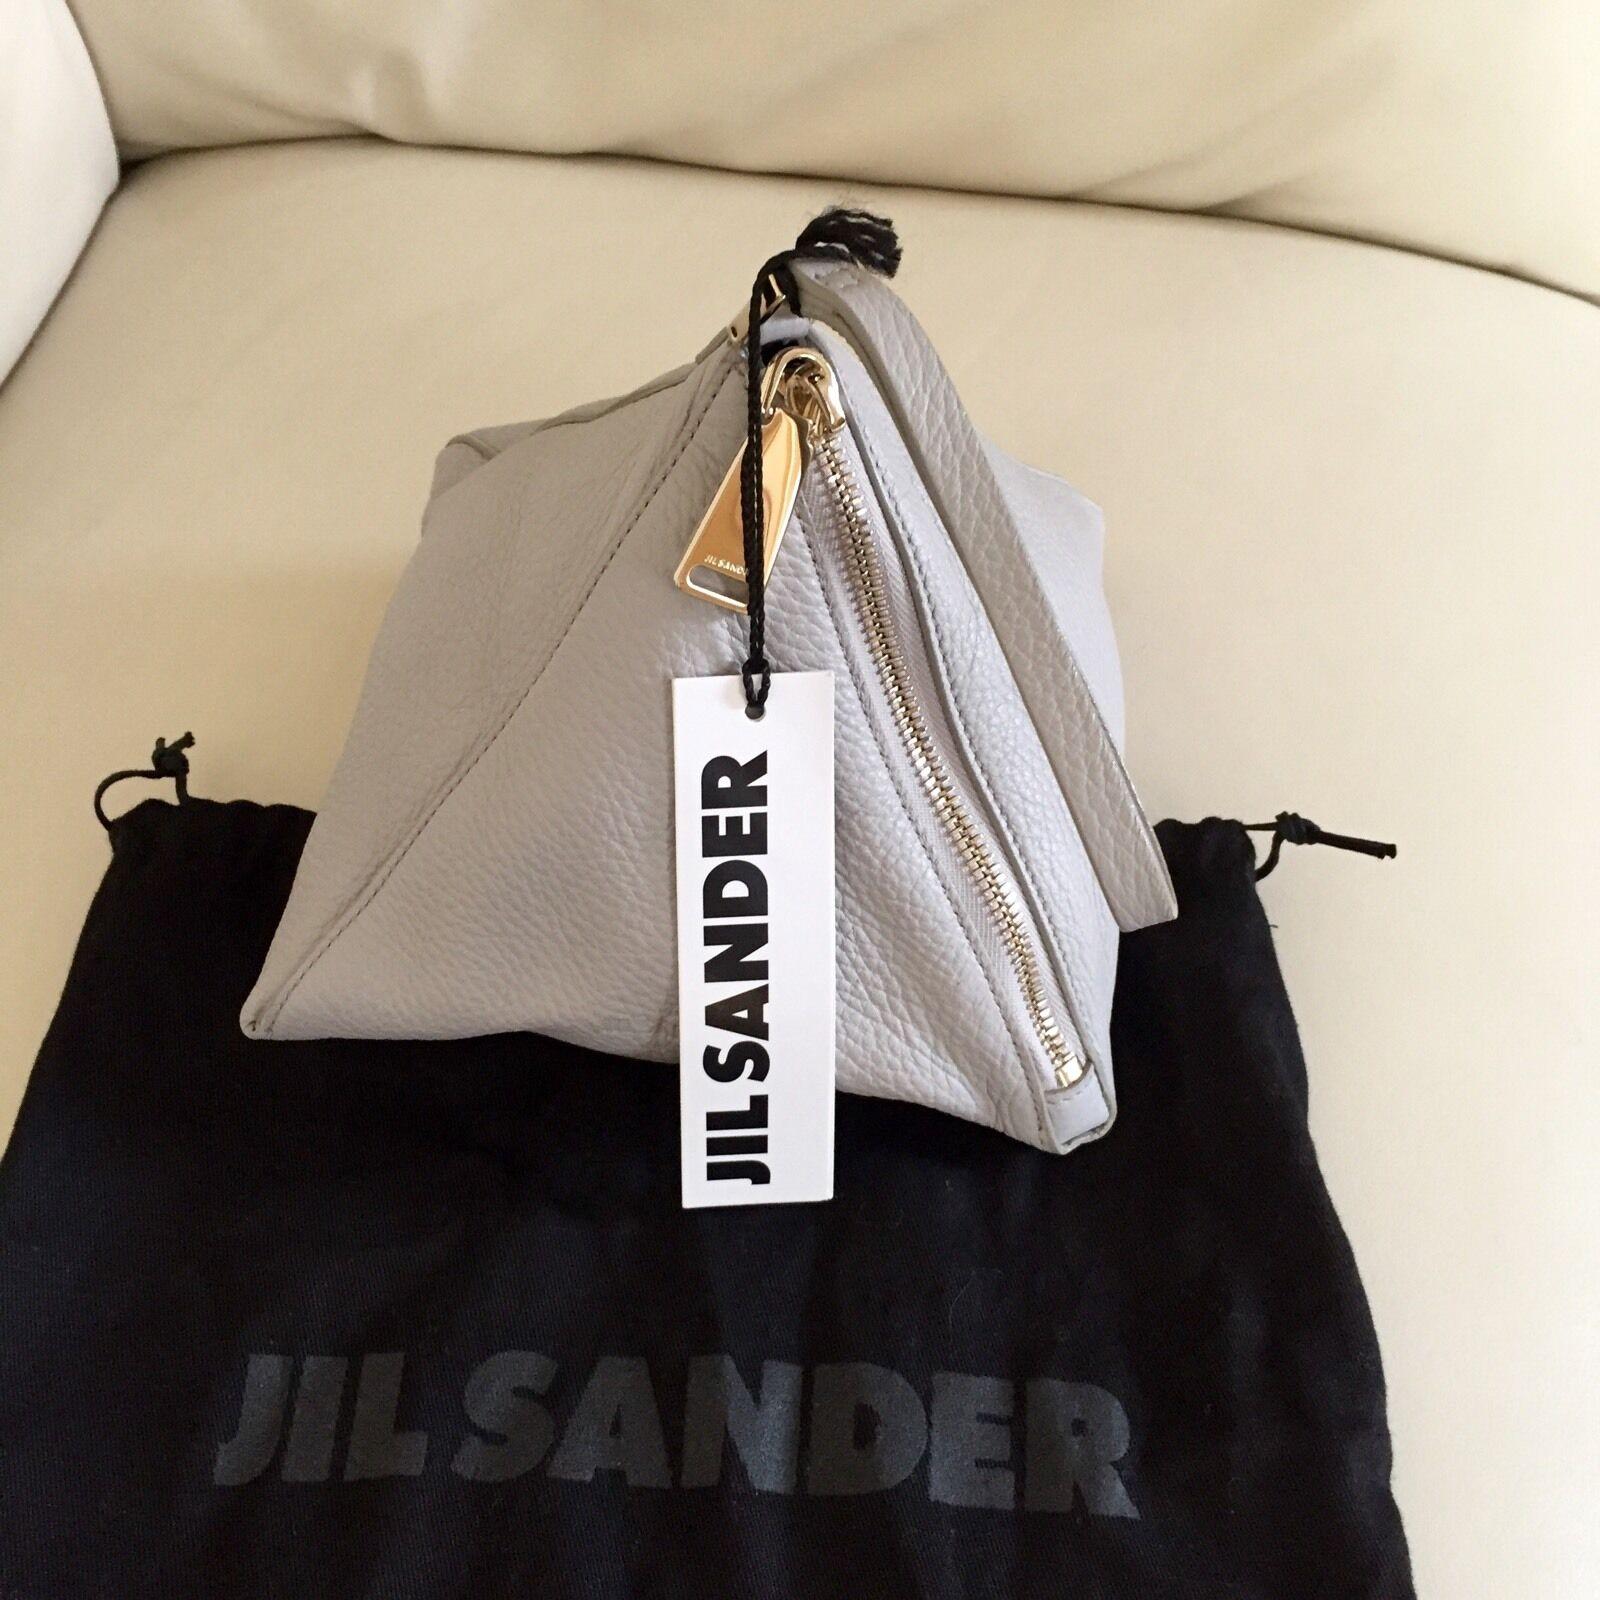 Neu  Jil Sander Sander Sander Leder Pyramide Clutch | Preisreduktion  | Überlegen  | Schön geformt  036e19